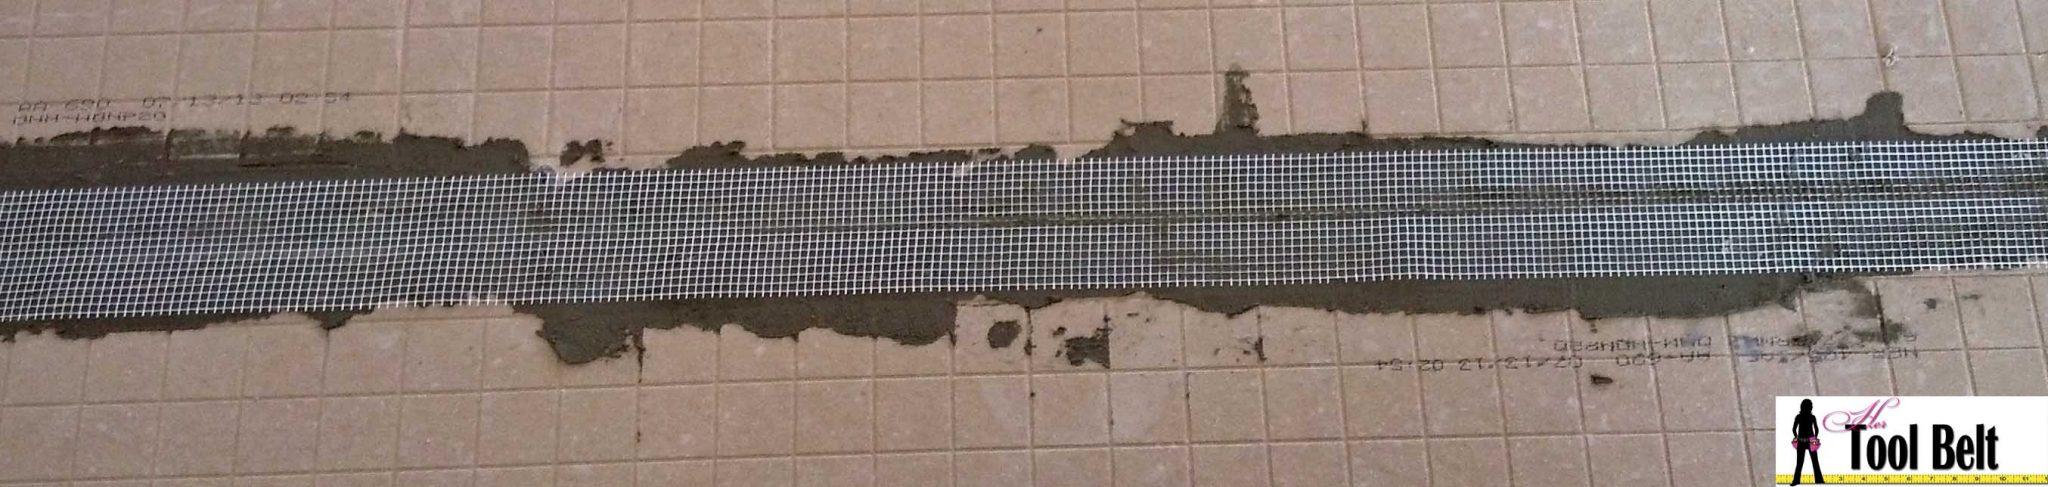 Travertine Versailles Pattern Tile Tutorial - Her Tool Belt